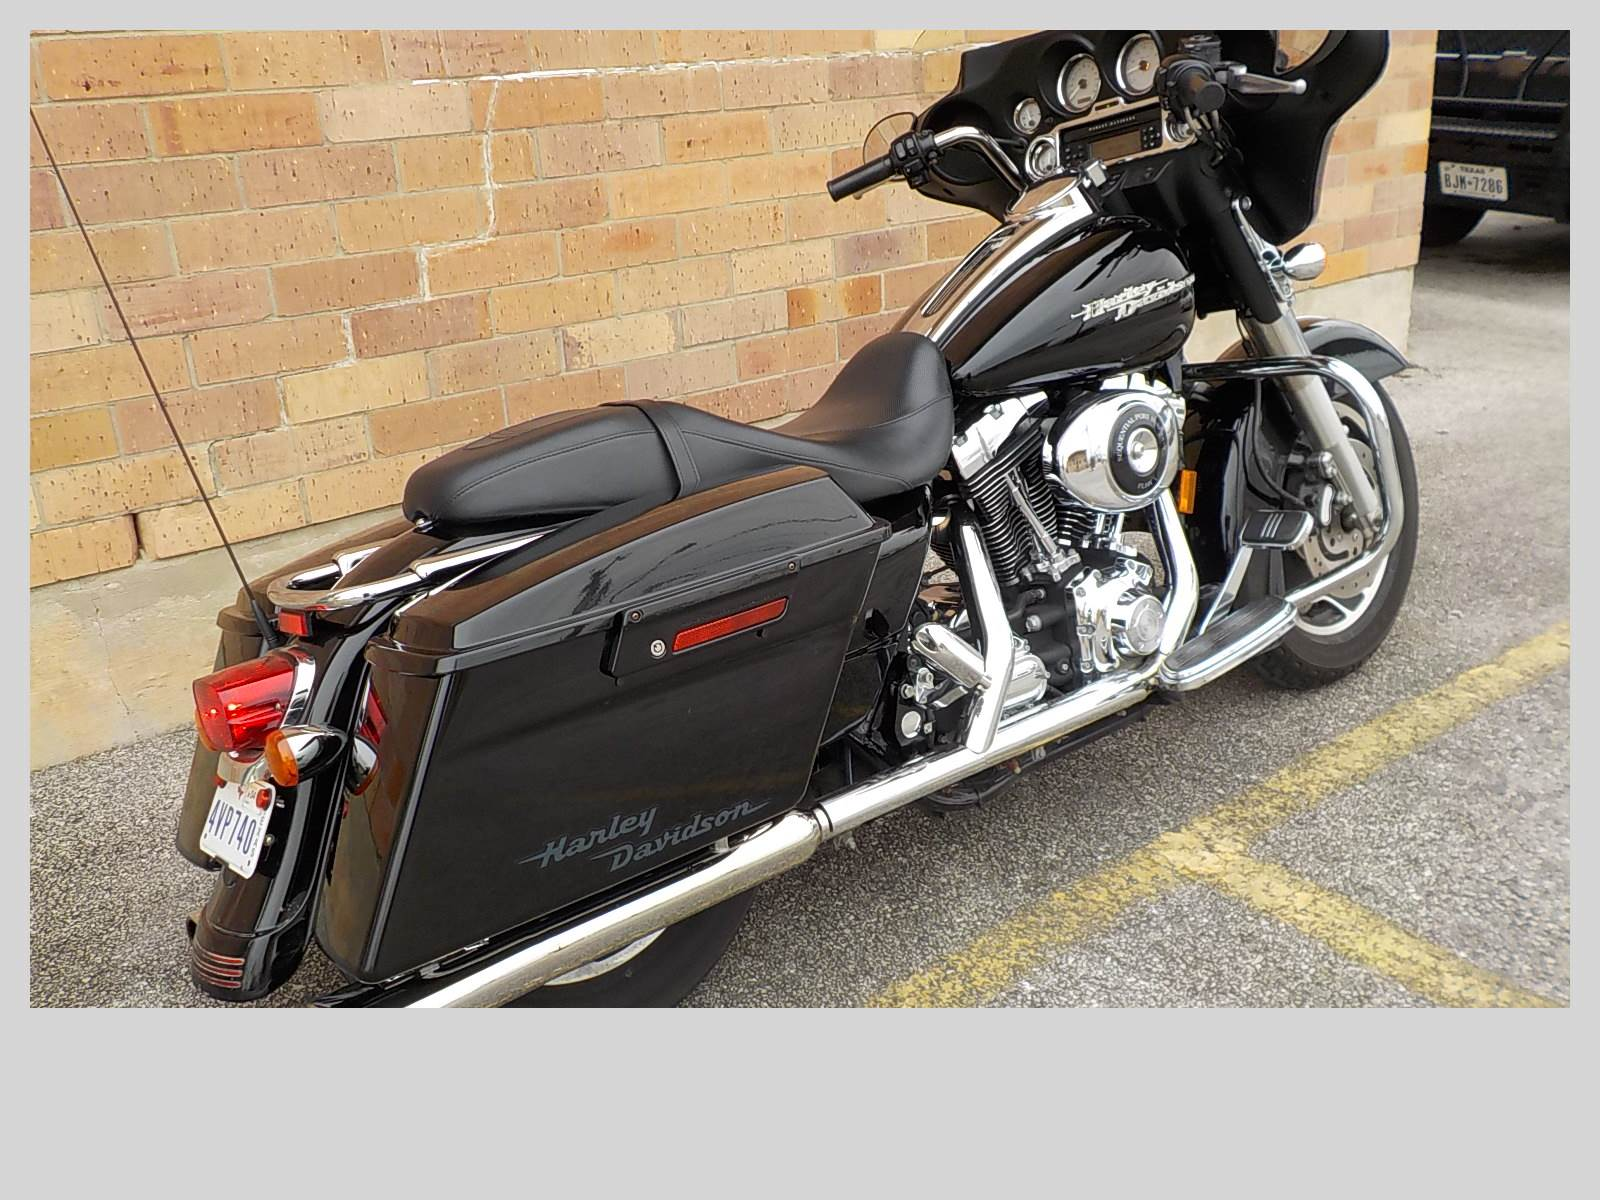 2006 Harley-Davidson Street Glide 5